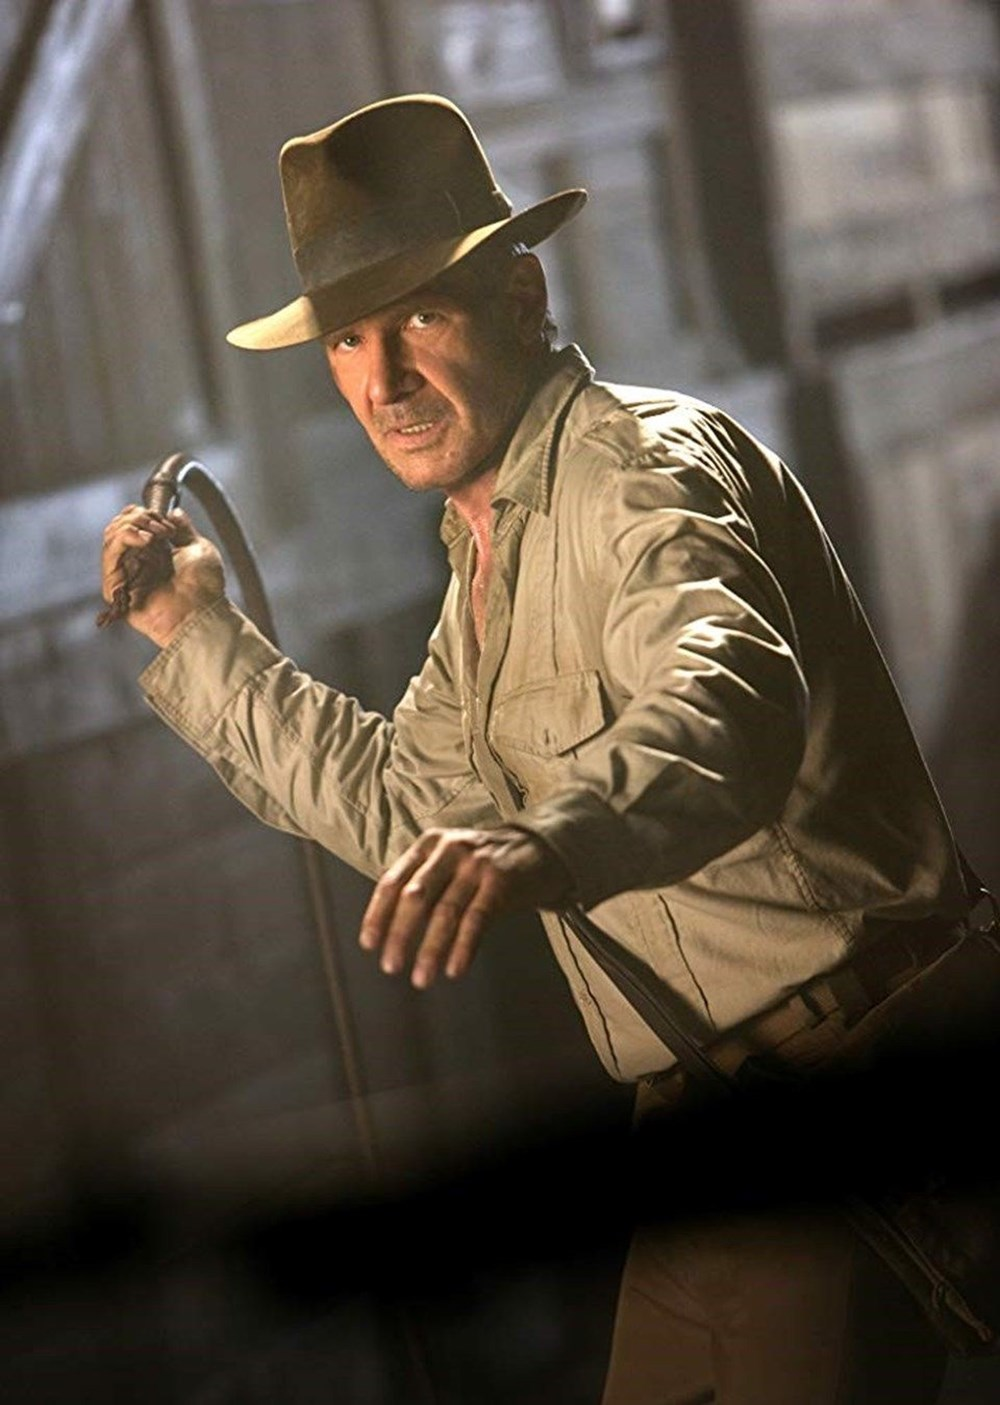 Jurassic World: Dominion 2022'ye ertelendi - 33